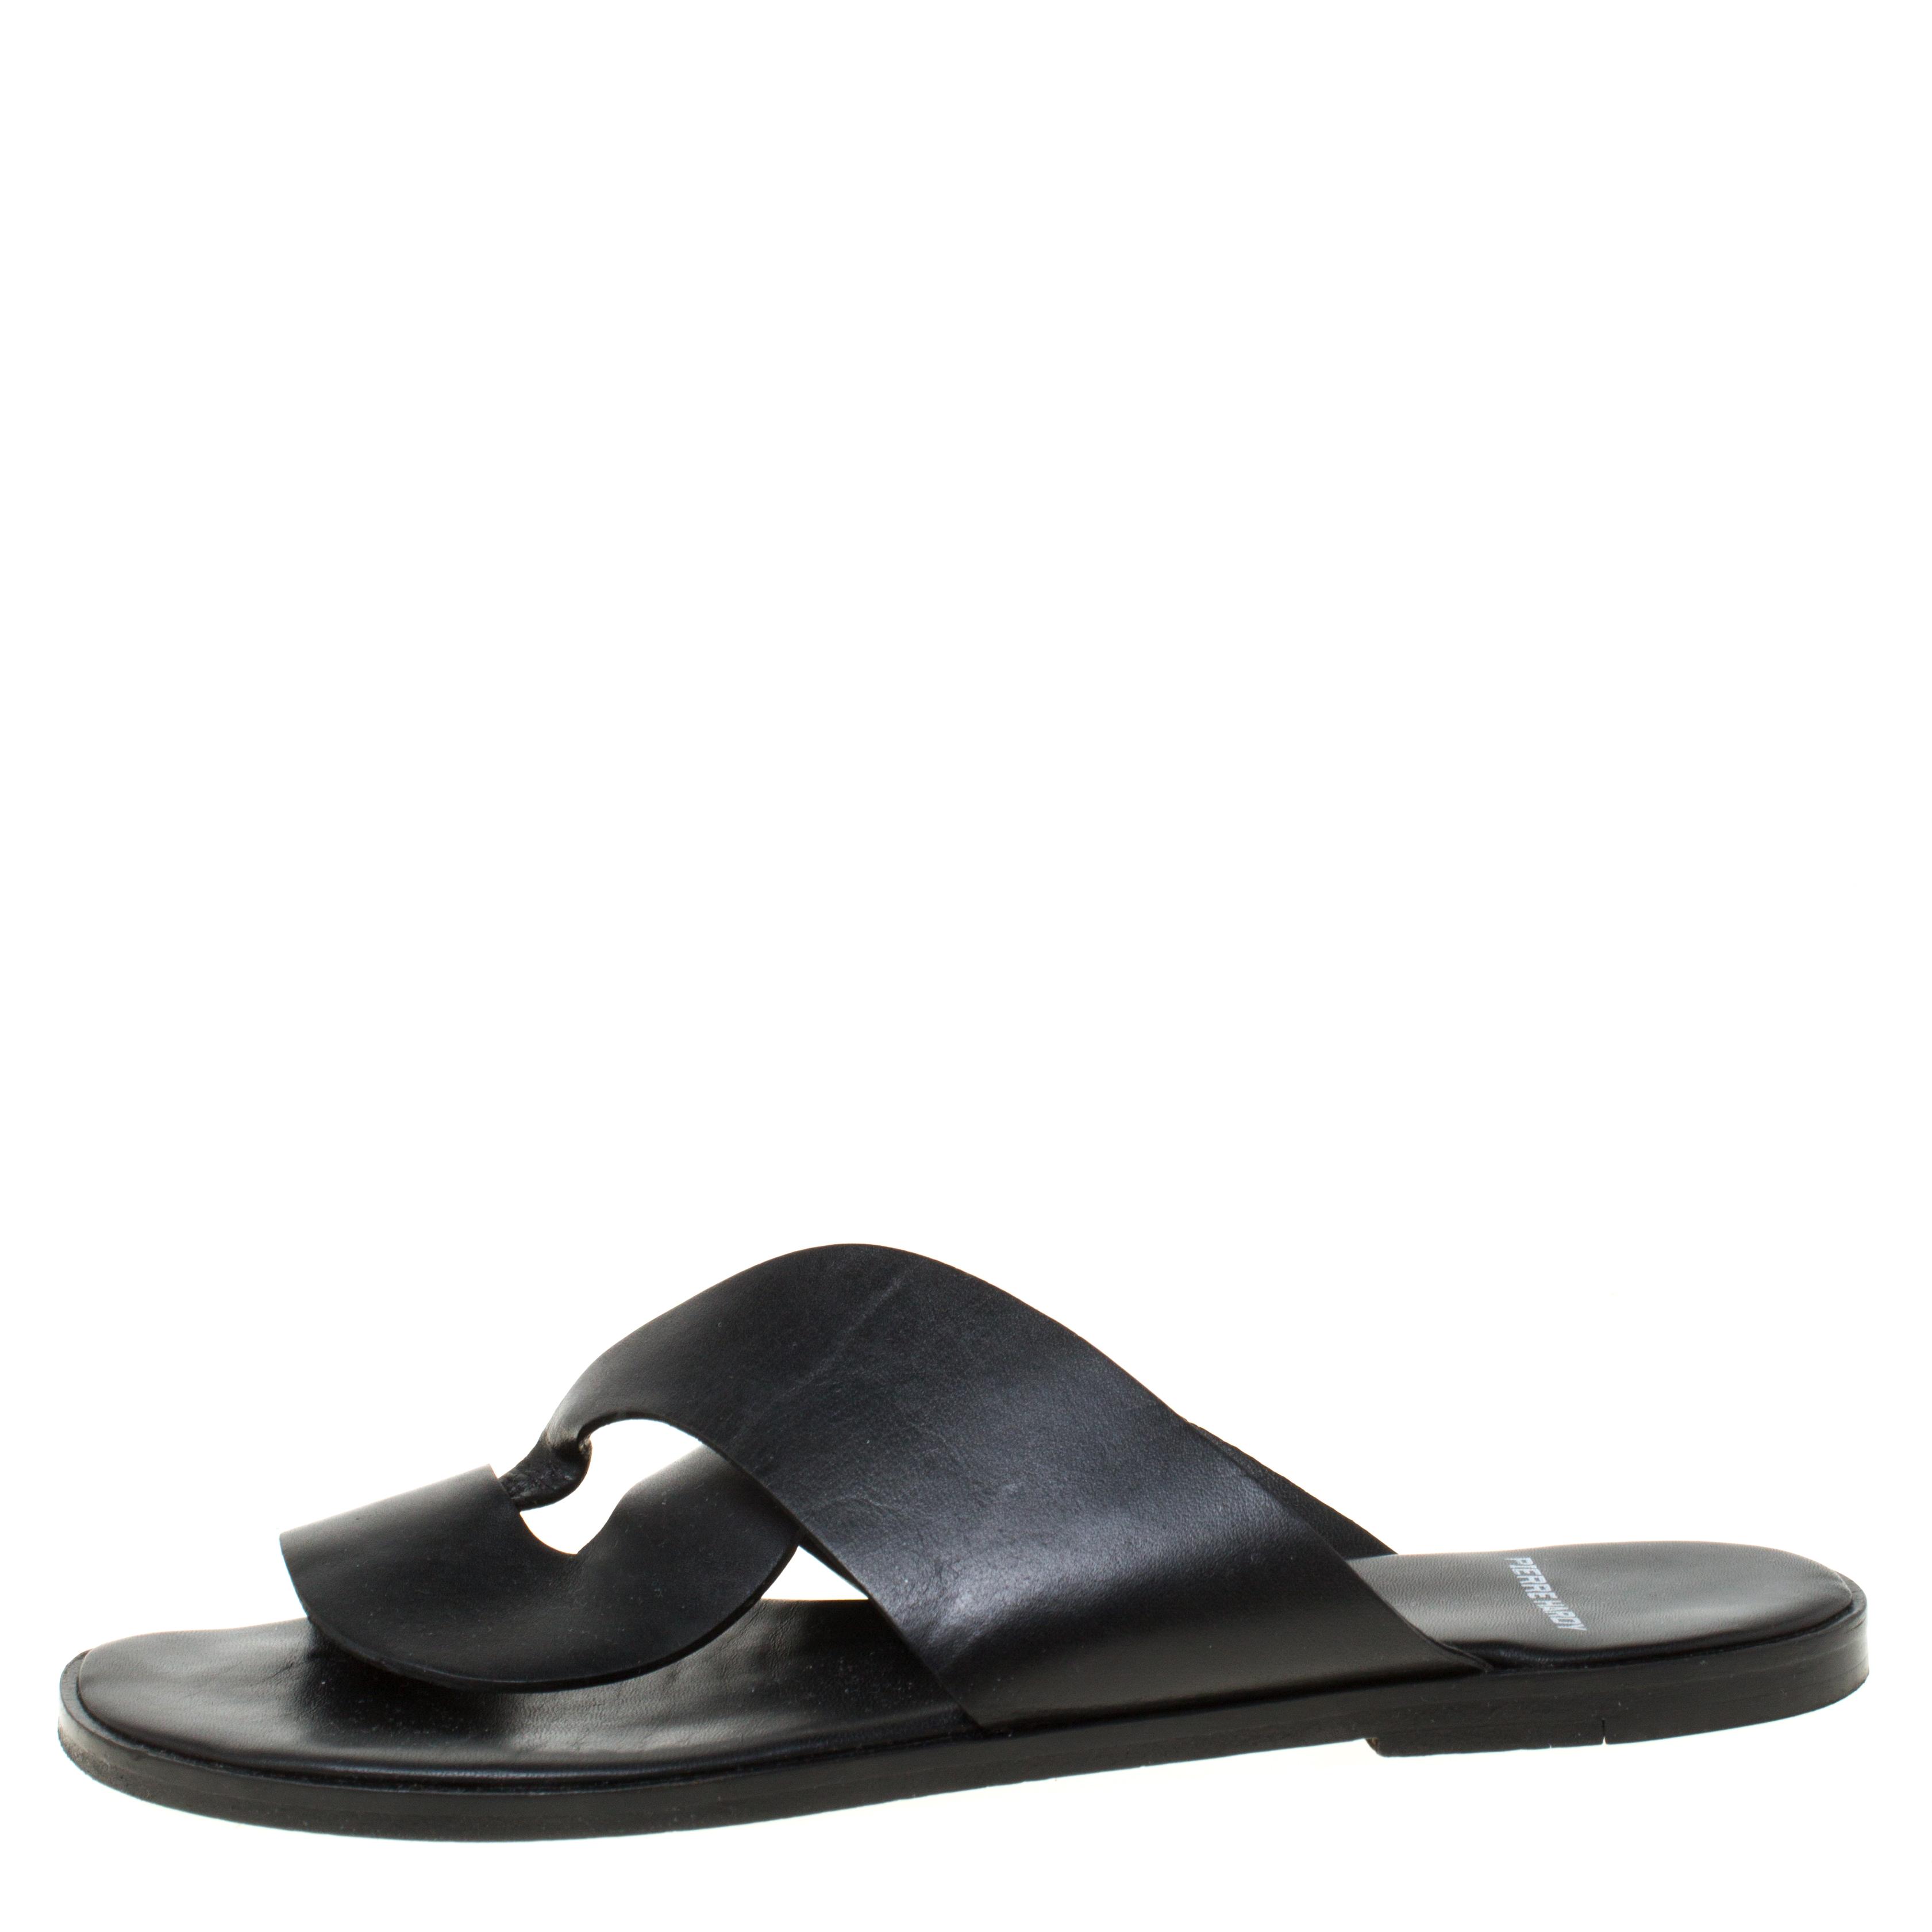 Pierre Hardy Noir Torsadé En Cuir Slide Sandals Taille 38